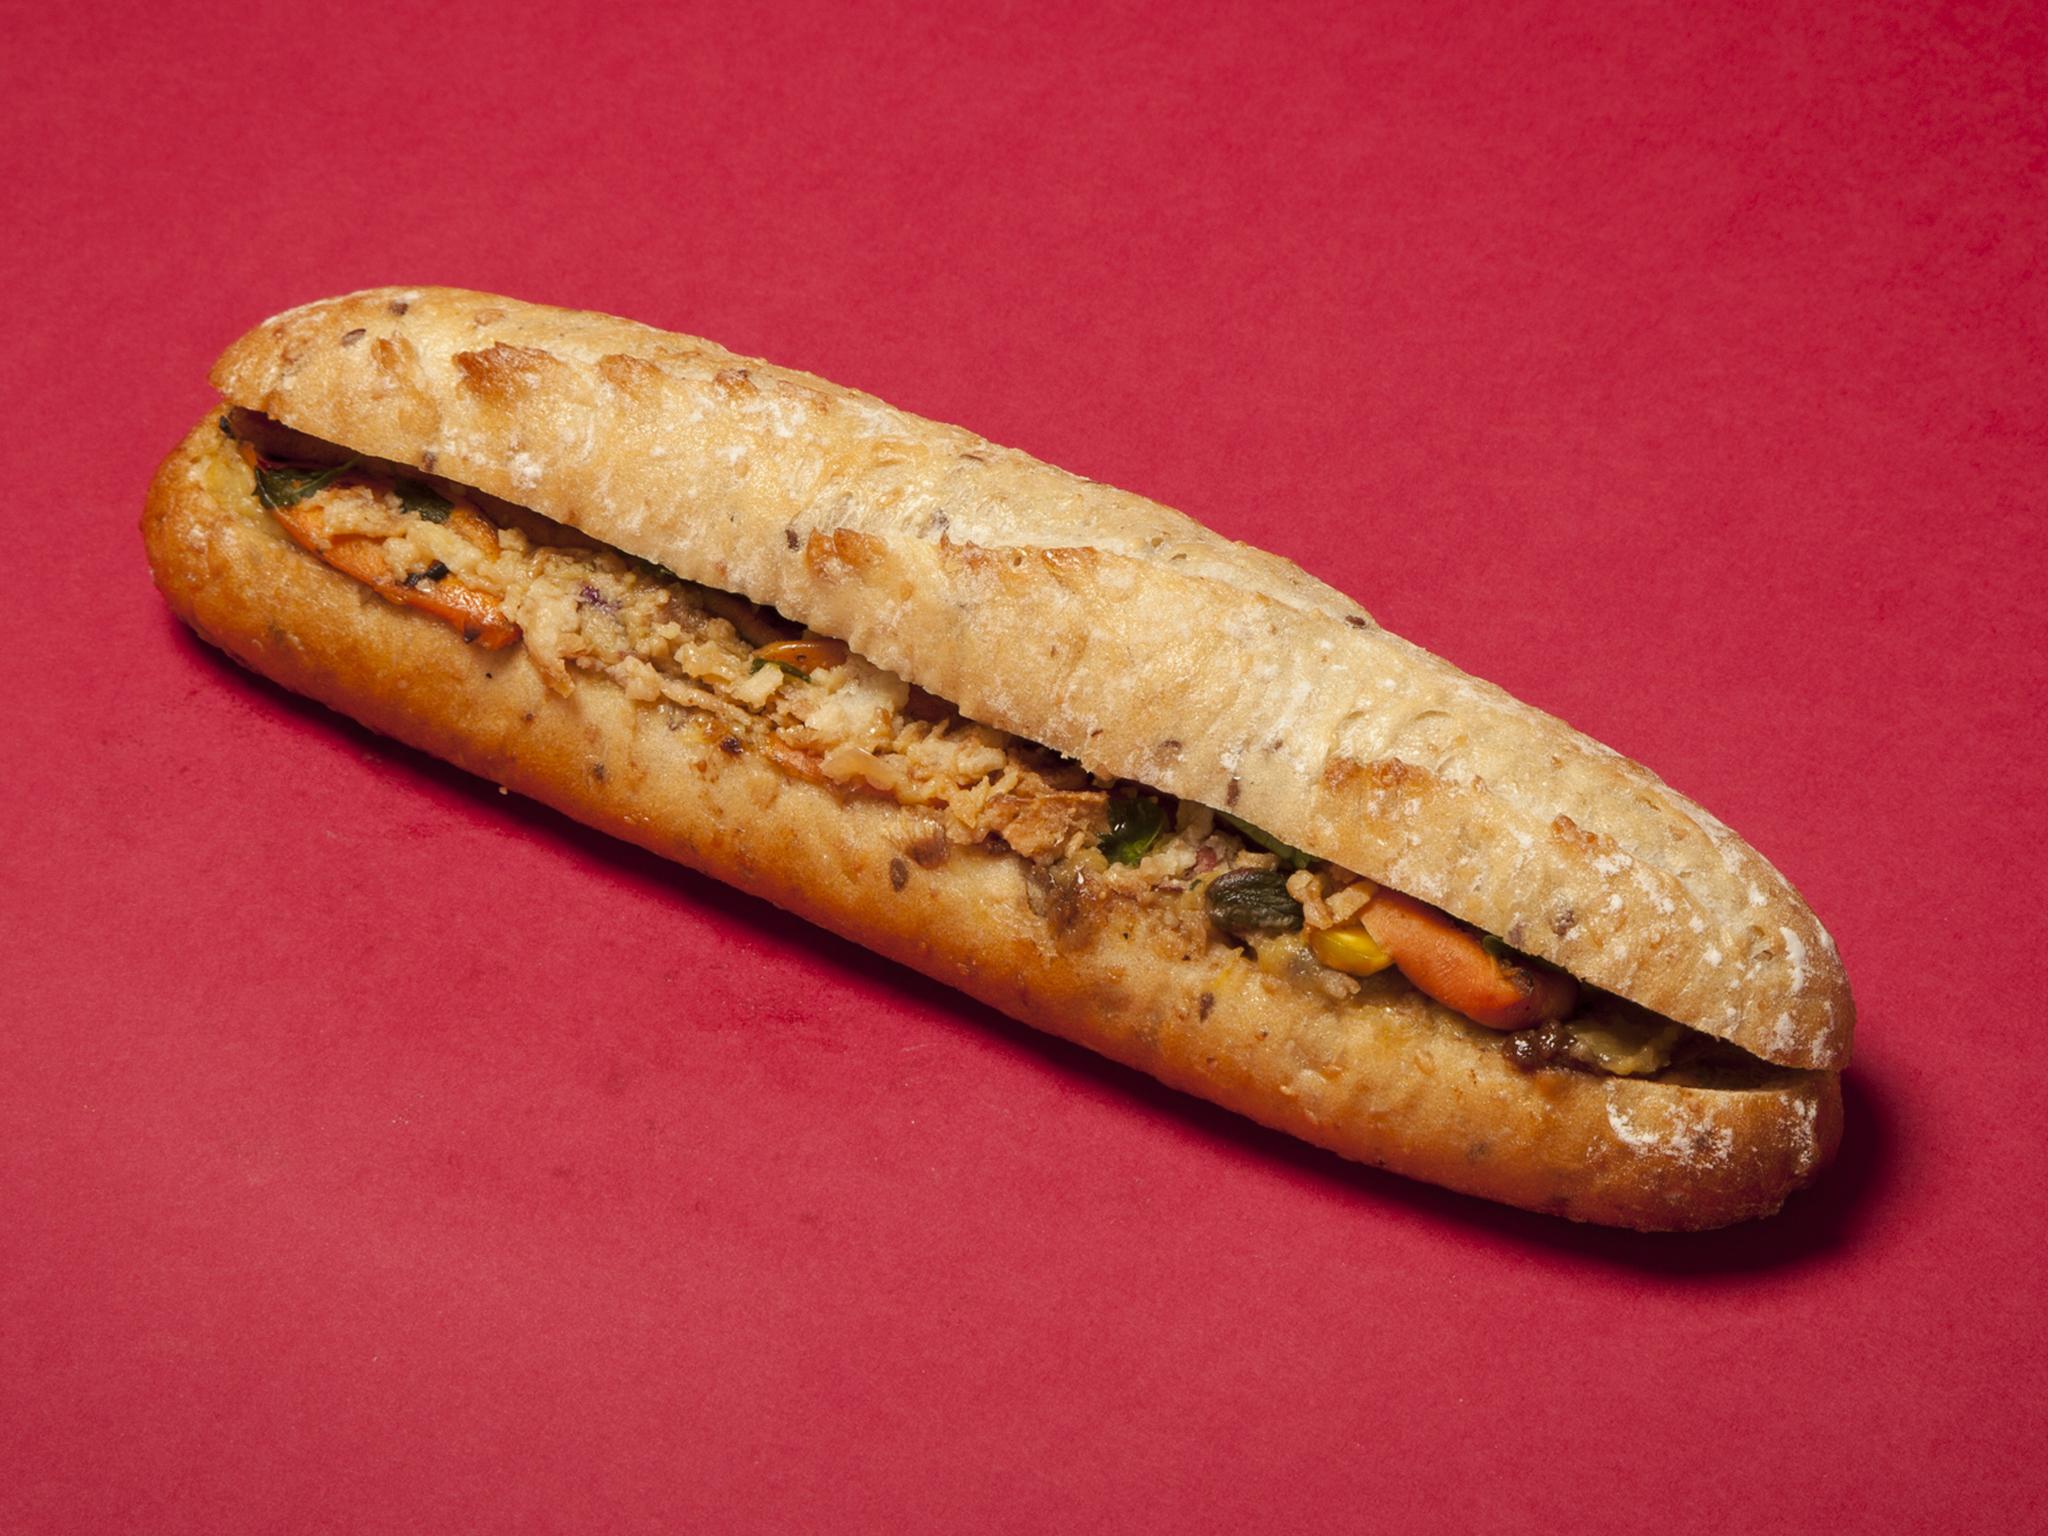 Pret: Very Merry Xmas Lunch Baguette (vegan)